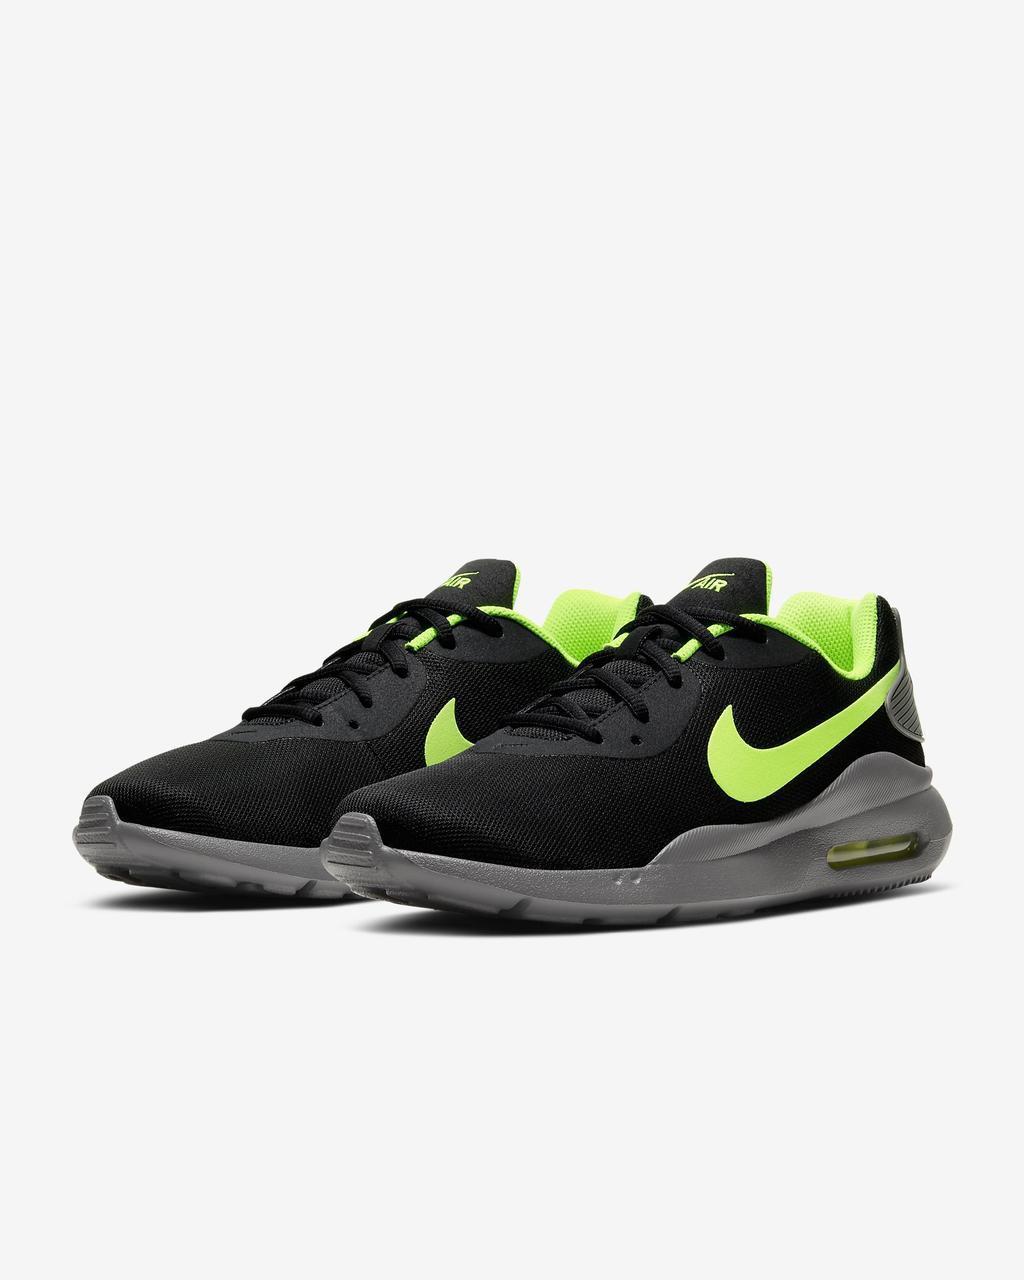 Мужские кроссовки Nike Air Max Oketo (оригинал, США) 42.5, (27.5 см)